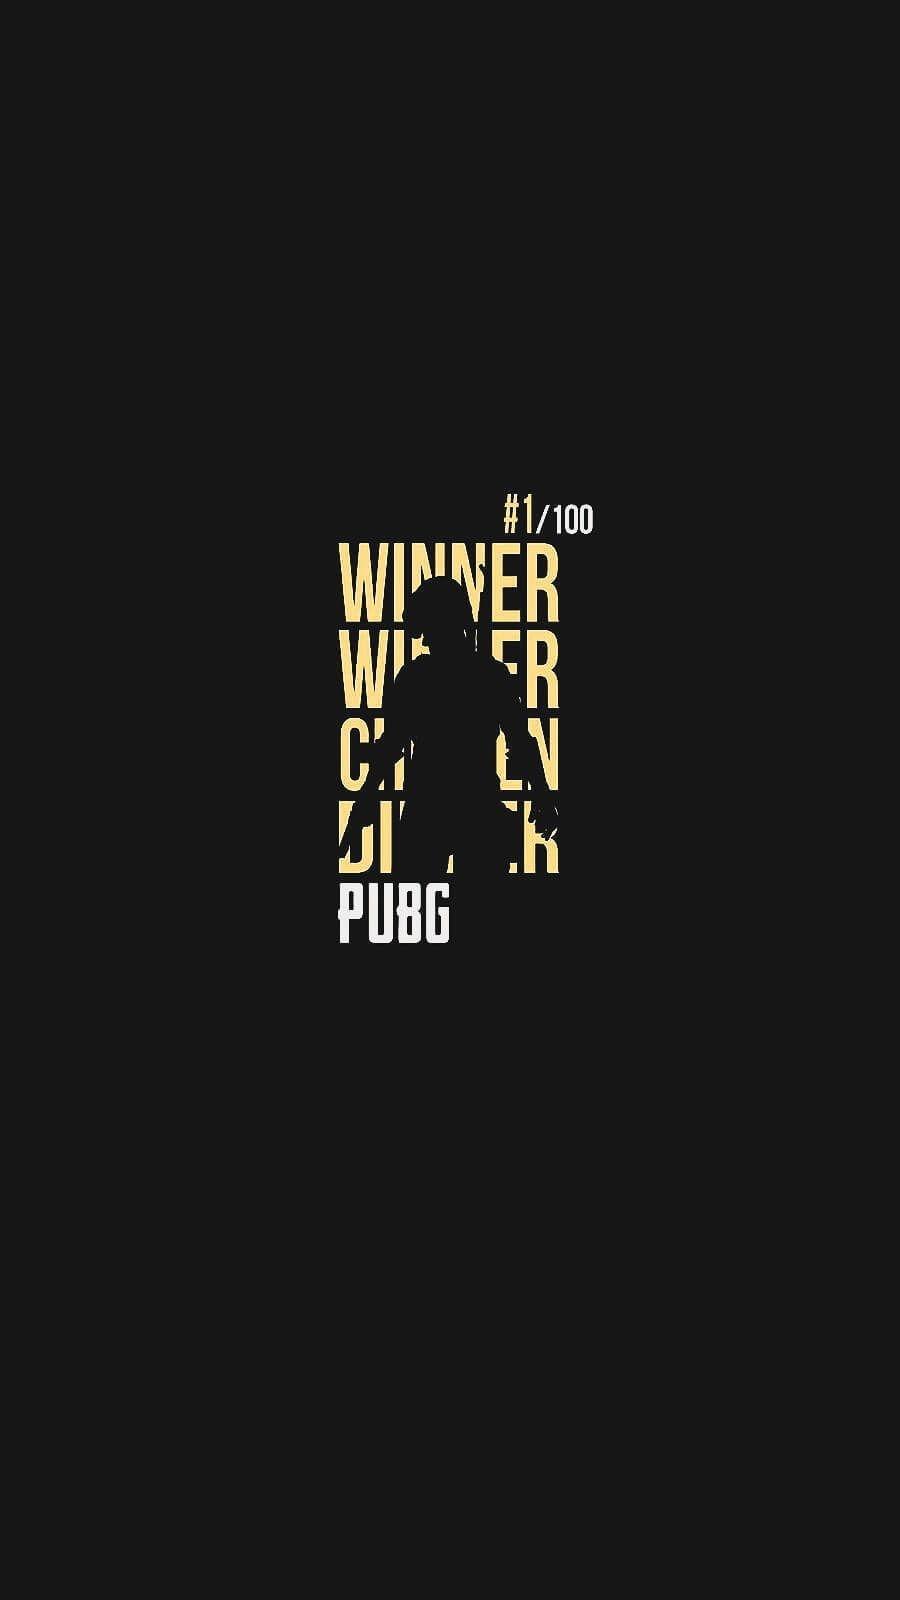 Winner Winner Chicken Dinner PUBG iPhone Wallpaper